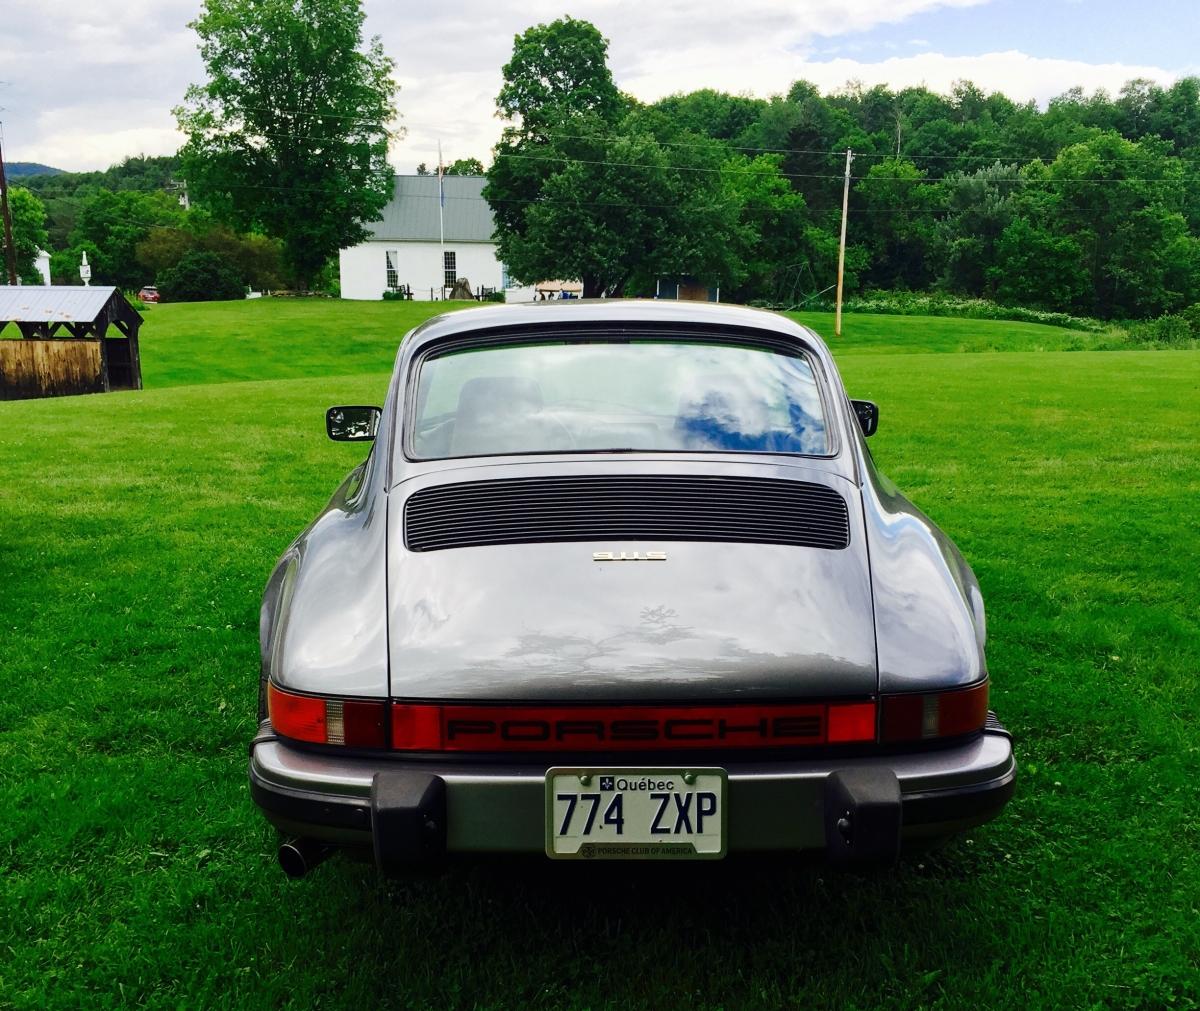 Zancy's rear end photo 6.24.17 watervilleIMG 7449